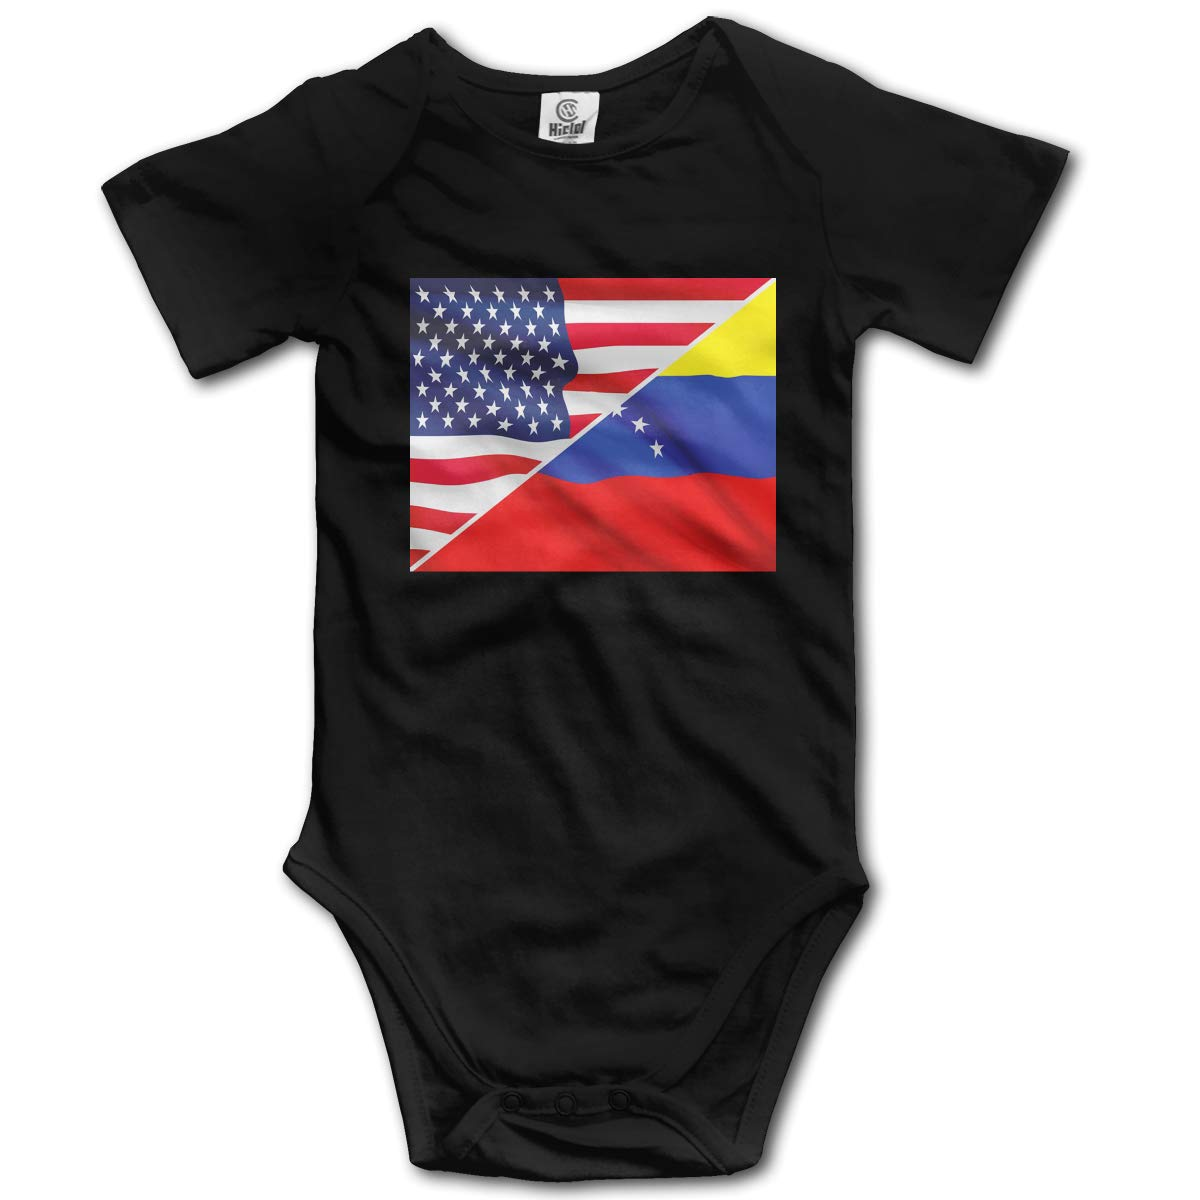 J122 Newborn at The Heart of US Venezuela Relations Short Sleeve Climbing Clothes Romper Jumpsuit Suit 6-24 Months